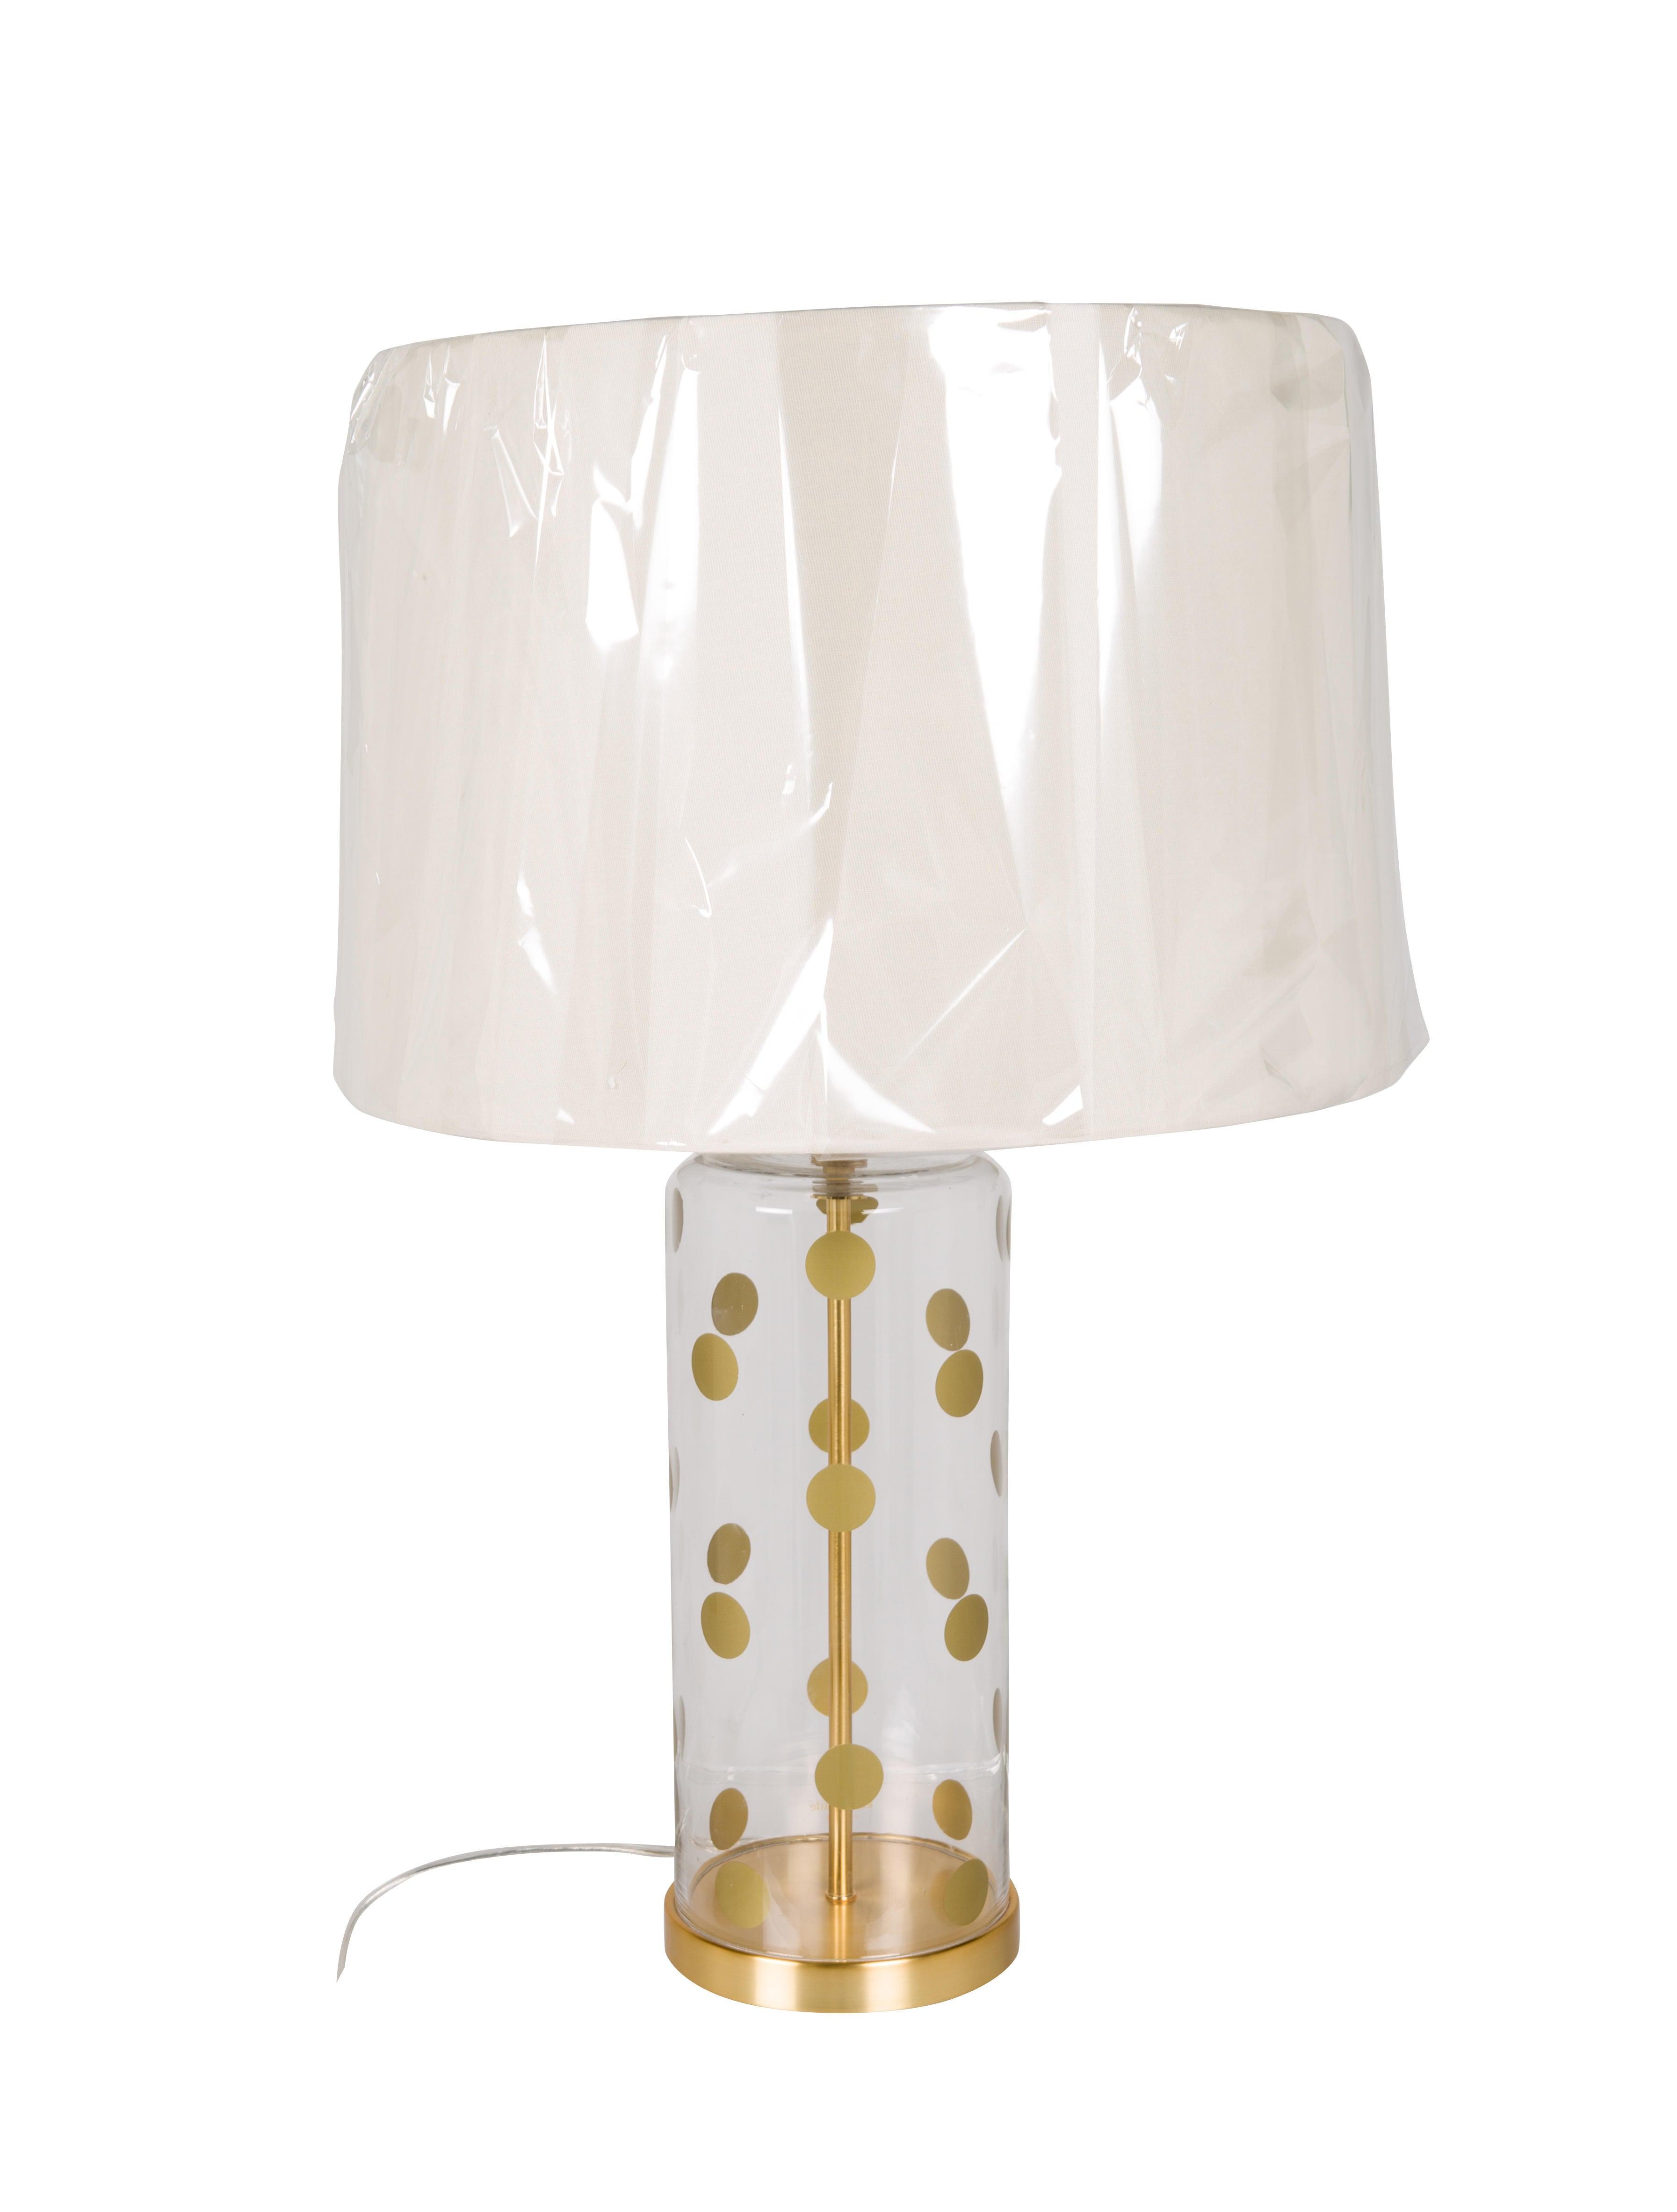 kate spade lamp bathroom kate spade new york modern pavilion clear dot table lamp lighting wka75513 the realreal